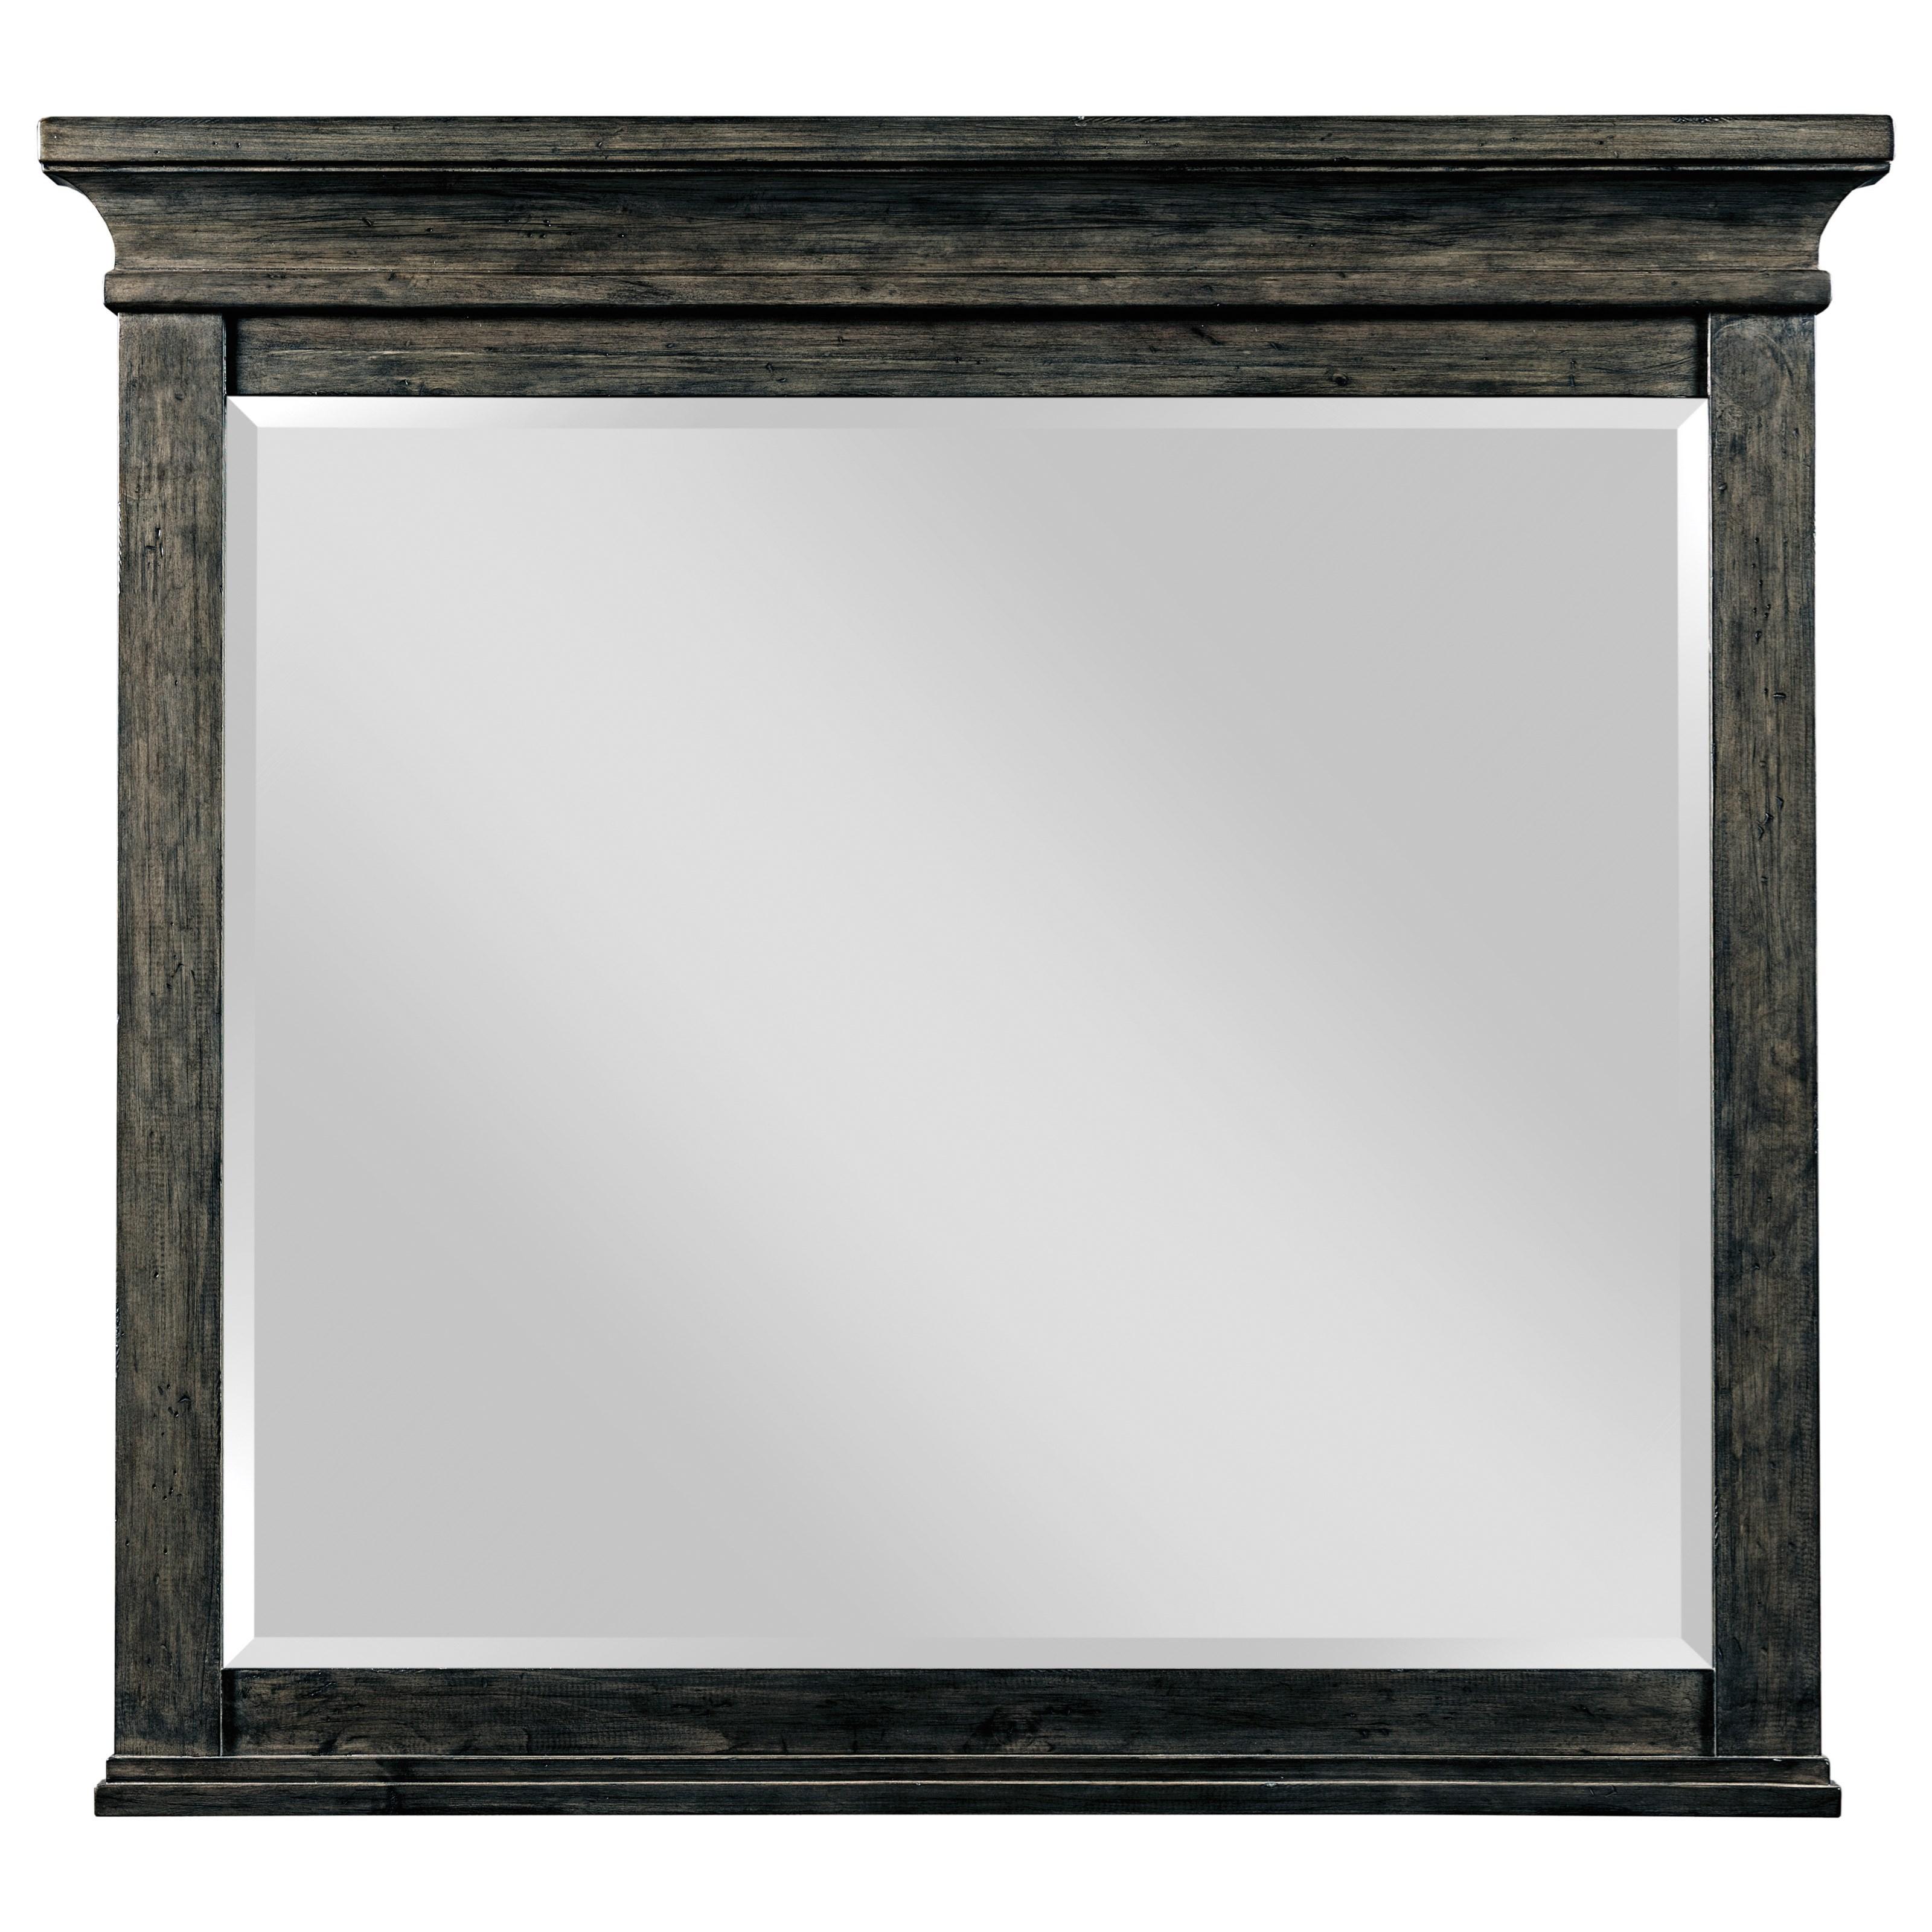 Plank Road Jessup Mirror                                at Stoney Creek Furniture